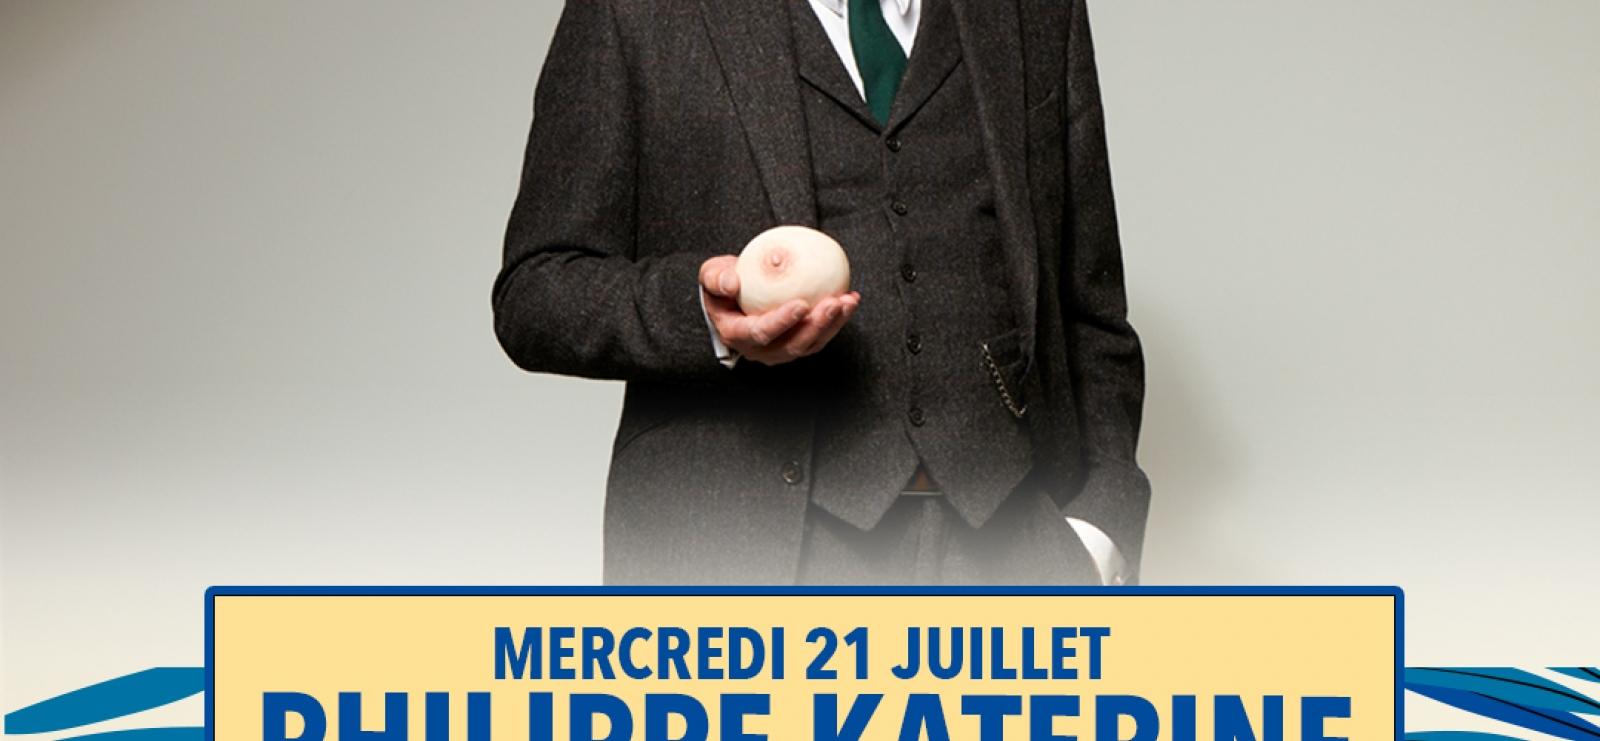 Concert : Philippe Katerine